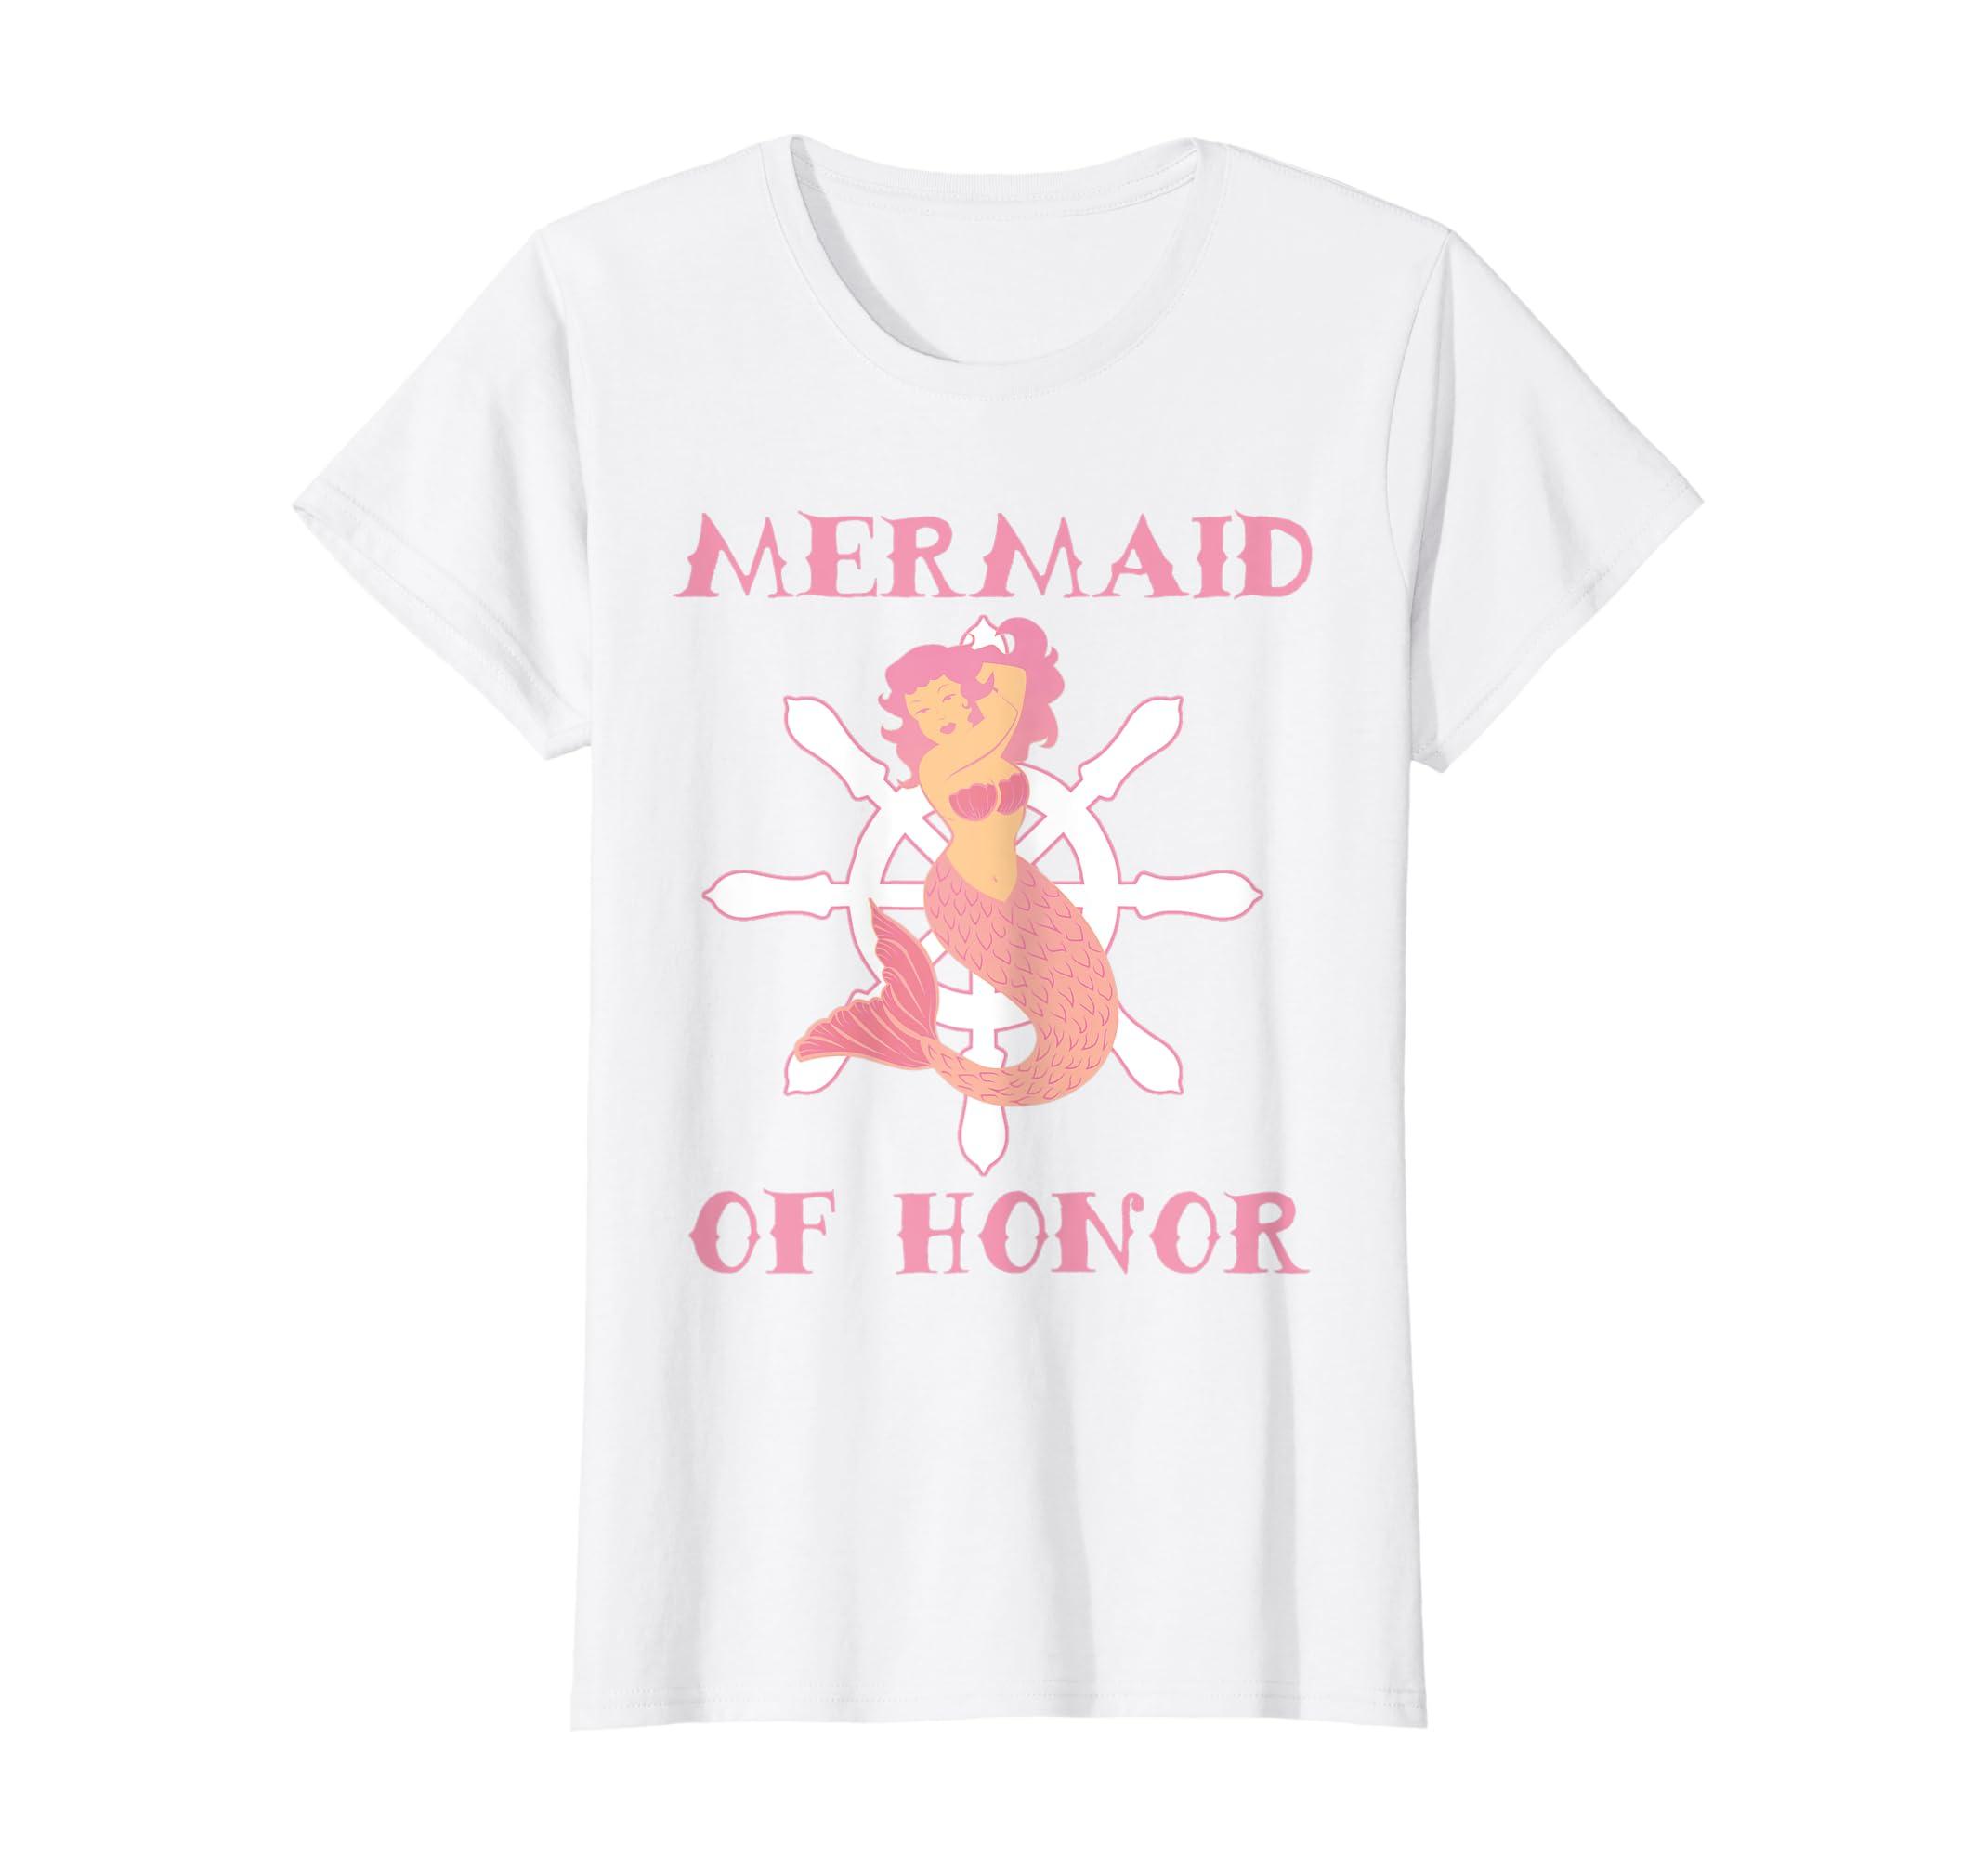 16f35d27 Amazon.com: Mermaid Graphic Tee Women Bridal Party Shirt: Clothing